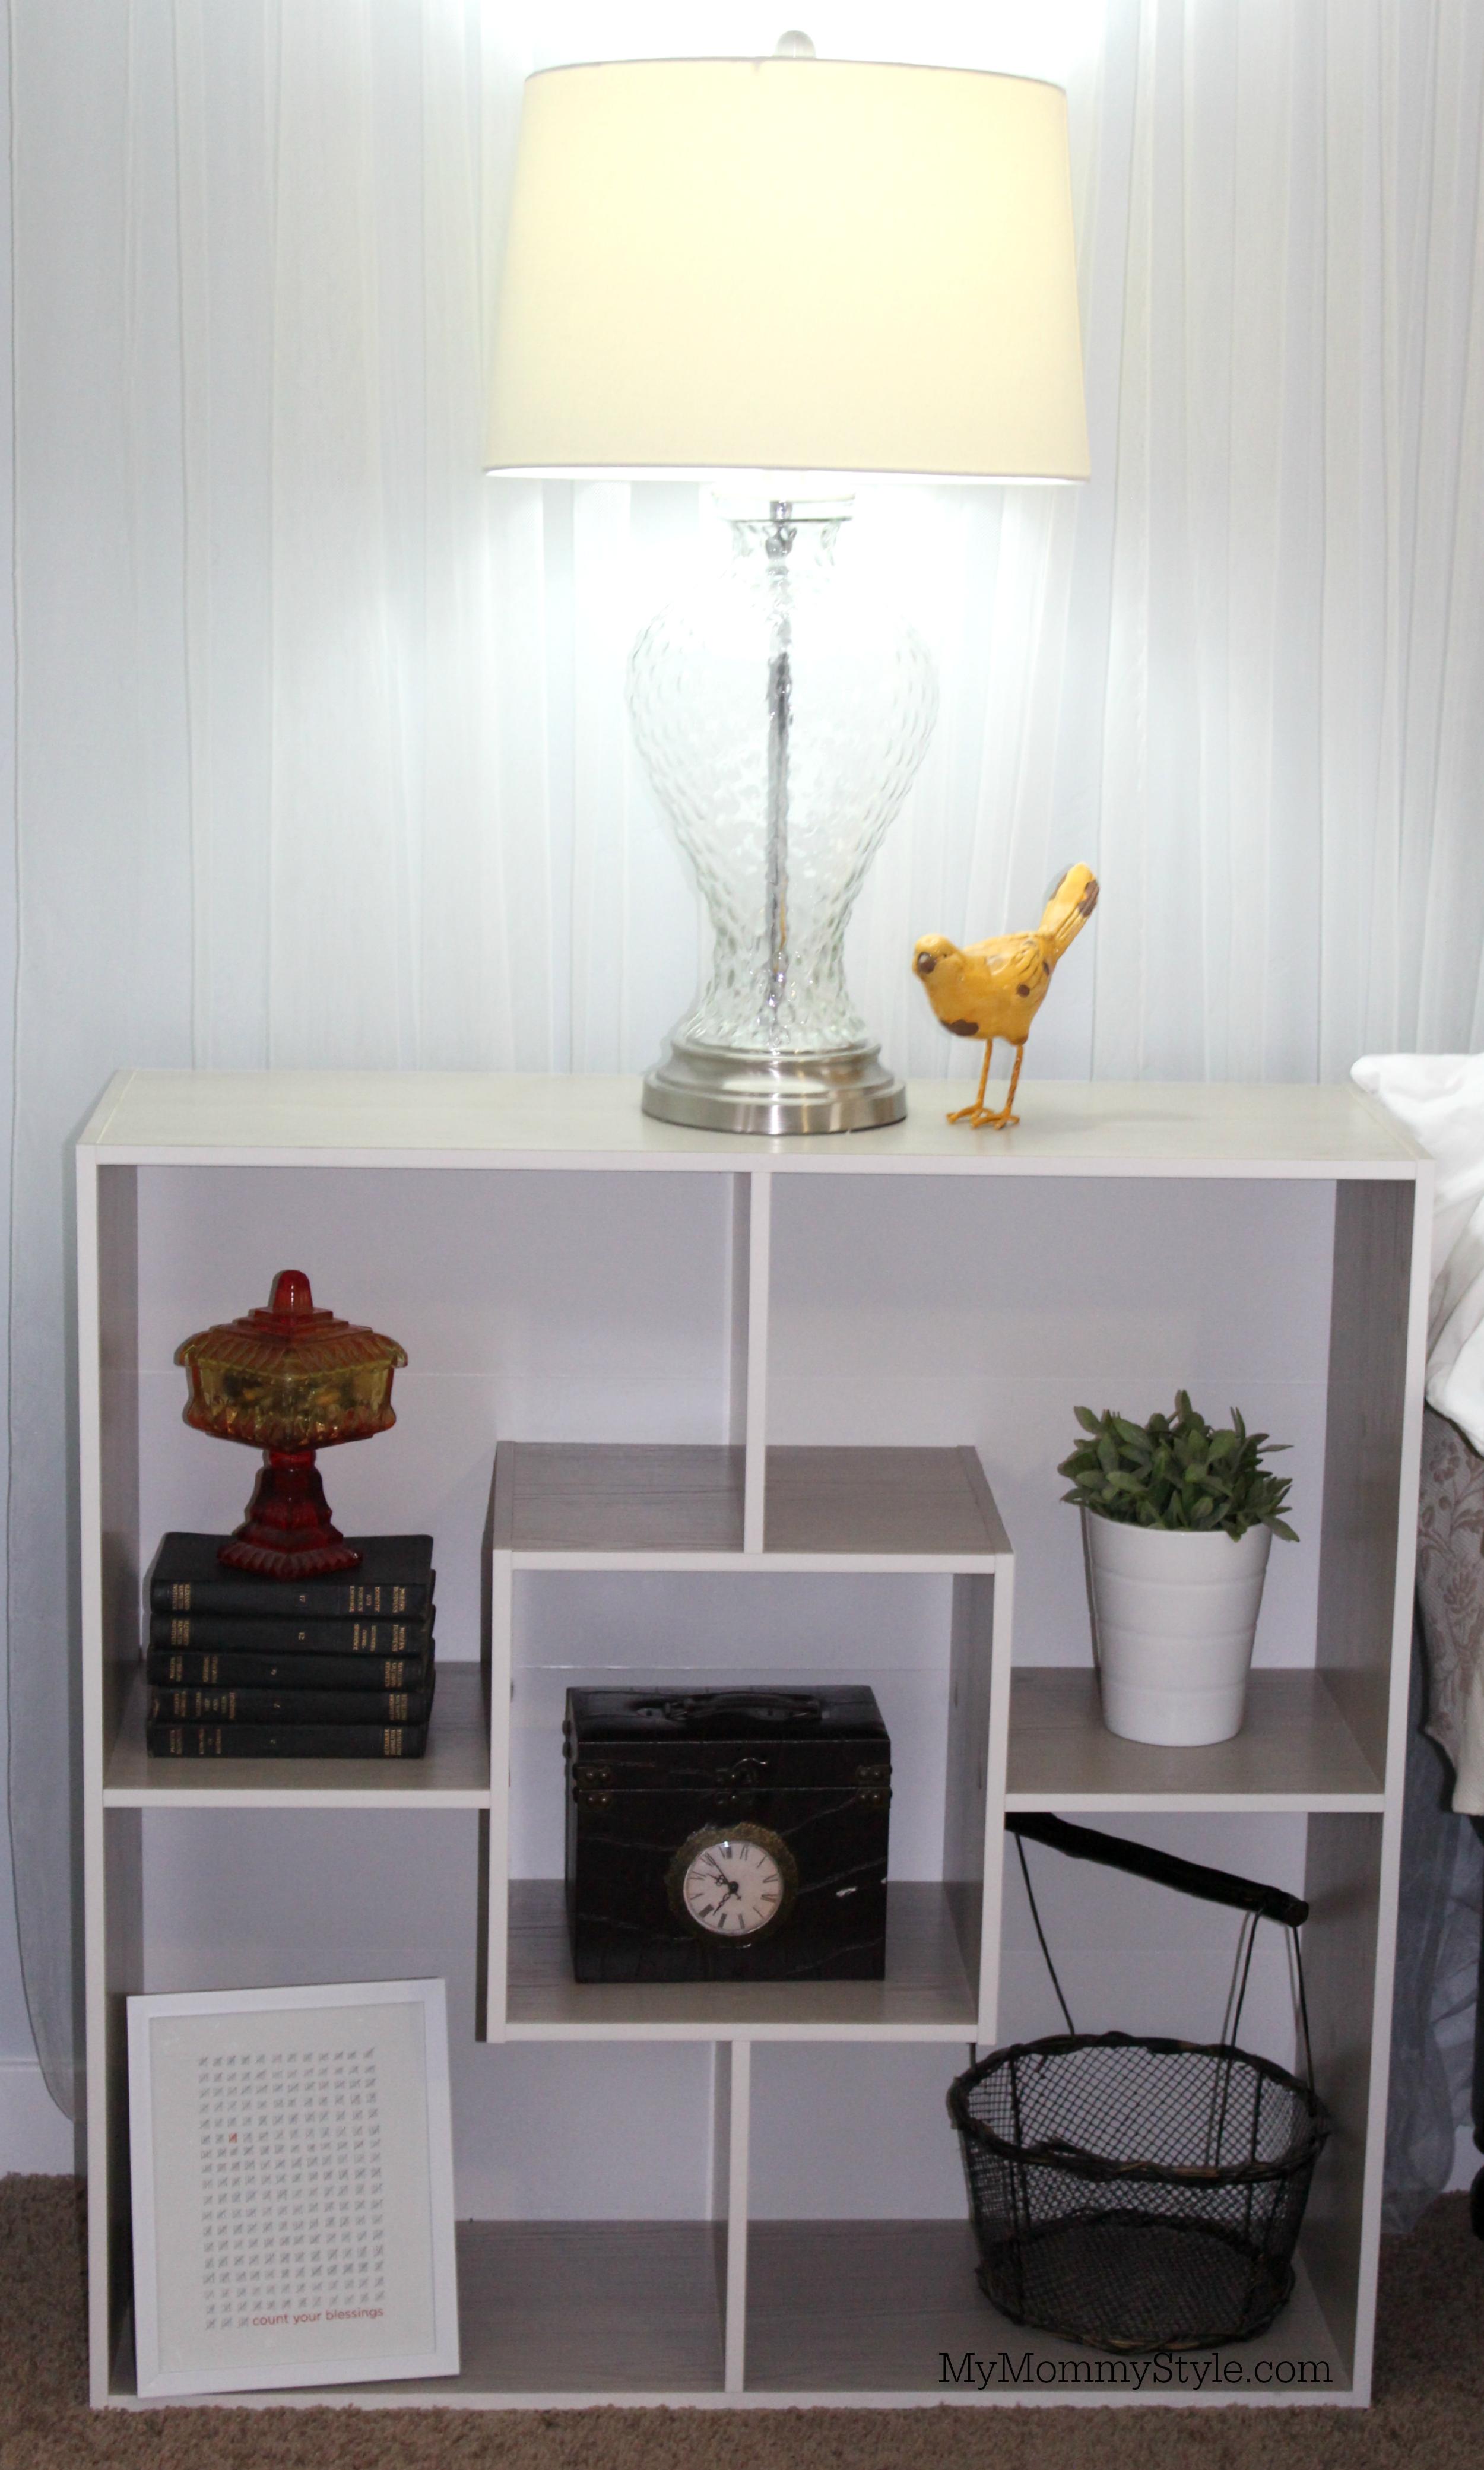 Sauder Furniture Side Tables Master Bedroom My Mommy Style Bookshelf